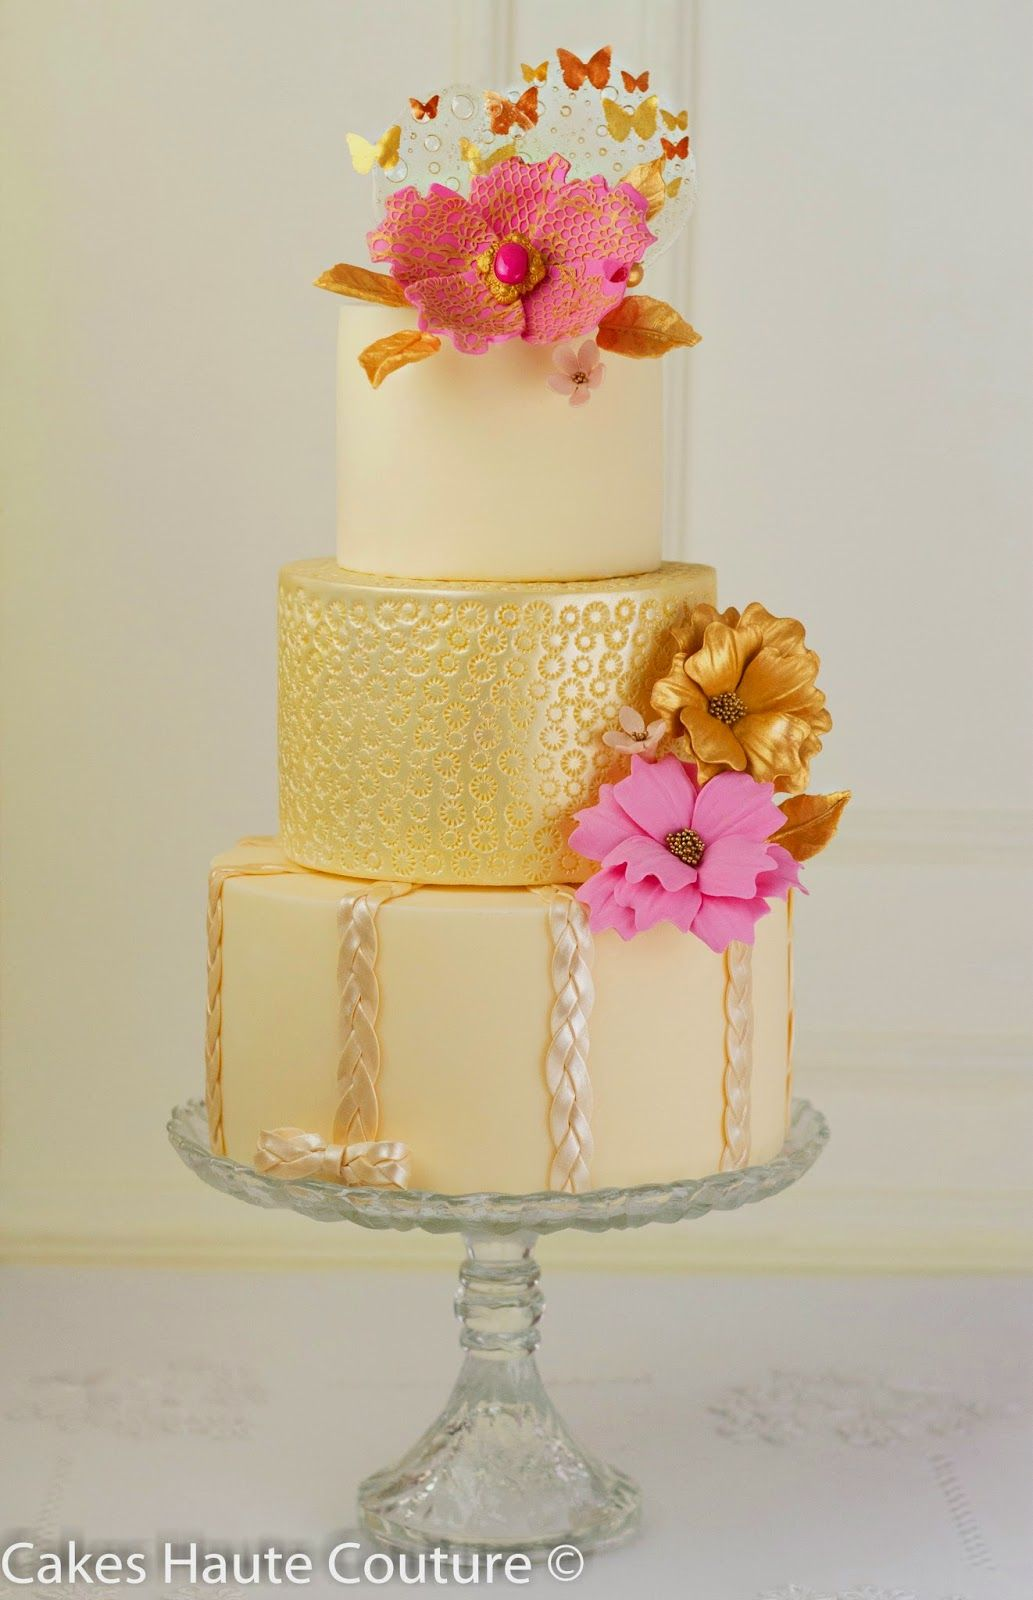 Cakes Haute Couture - El Blog de Patricia Arribálzaga: NUEVO Curso ...